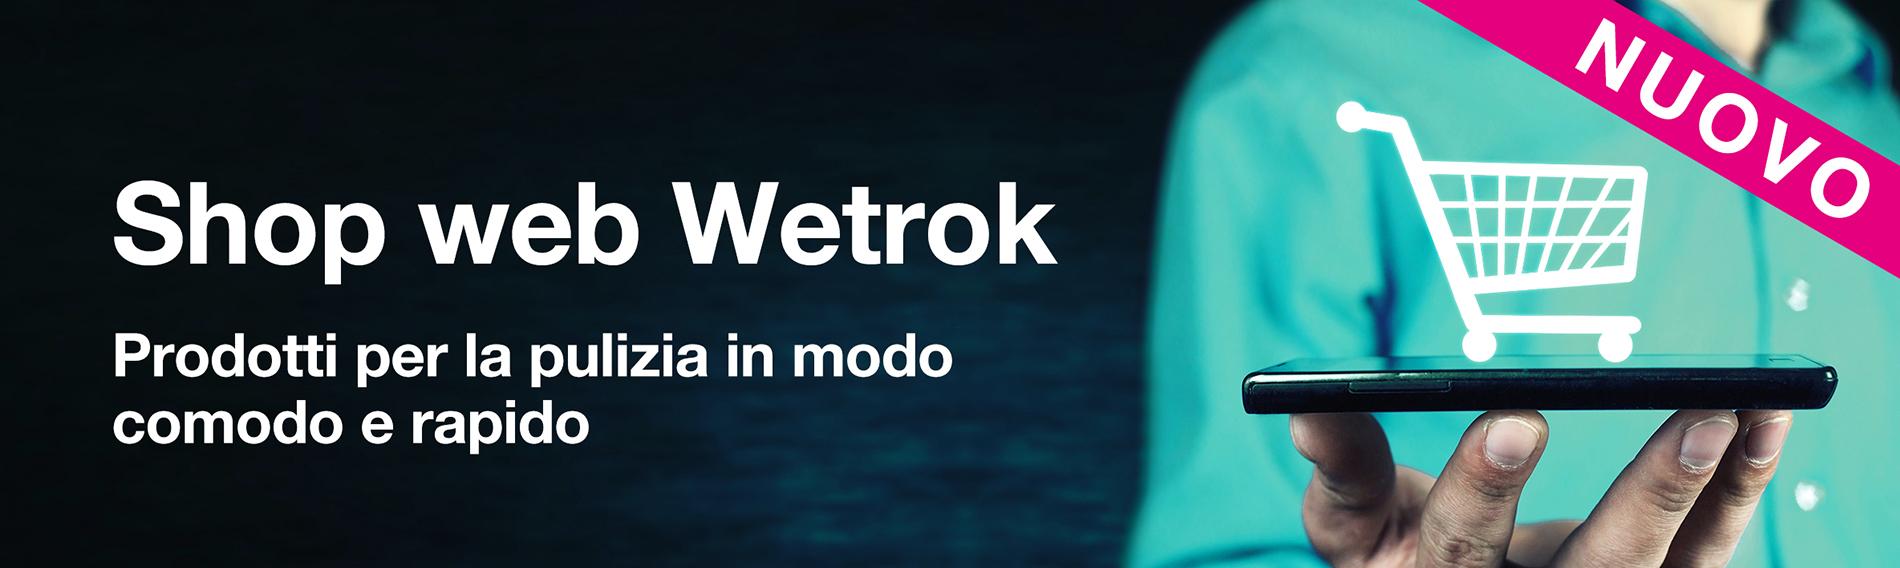 Nuovo webshop Wetrok